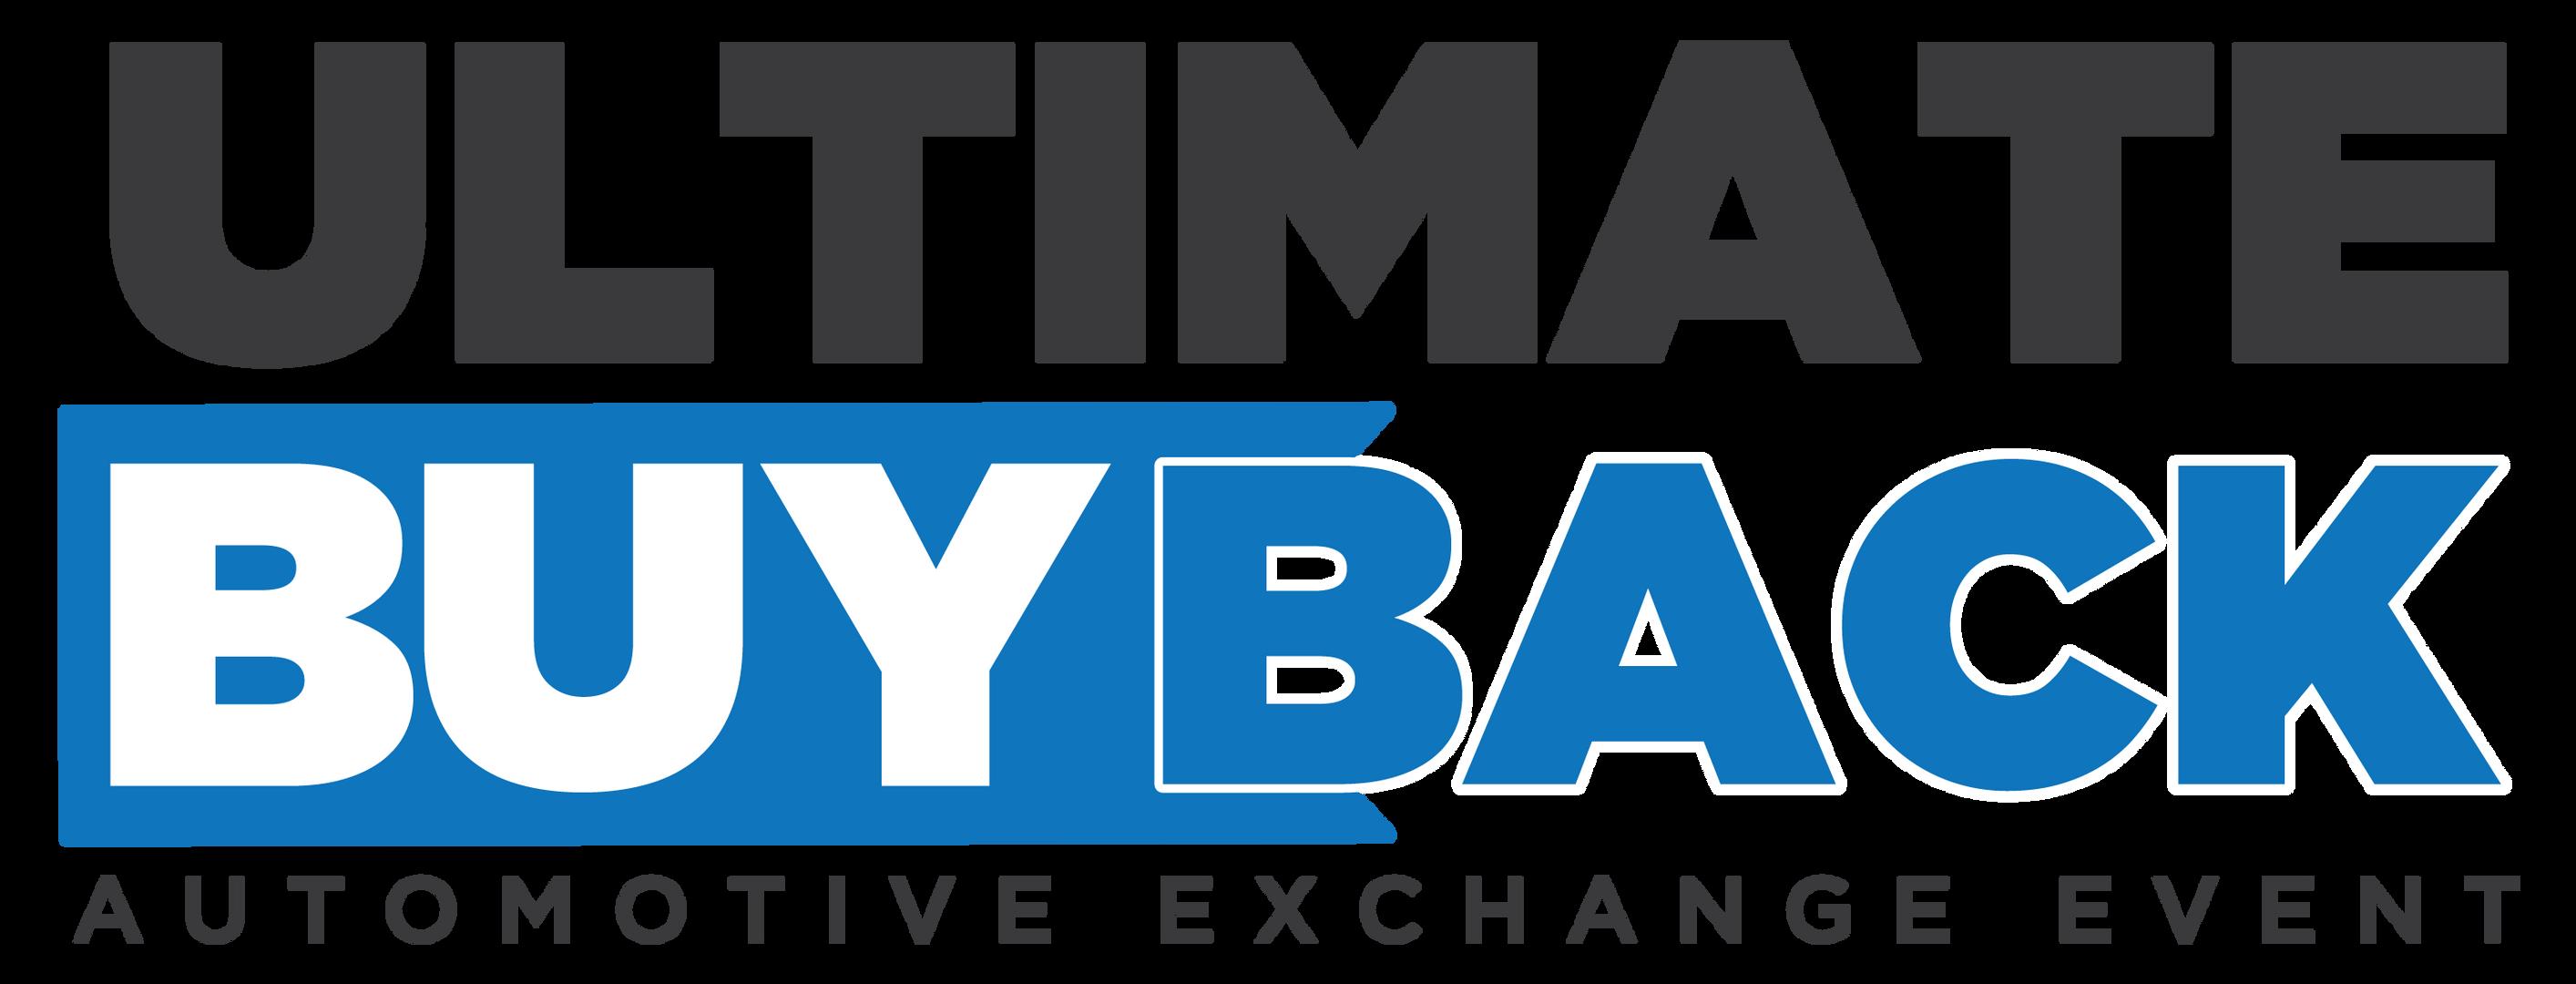 UltimateBuybackExchangeEvent-BLUE.png